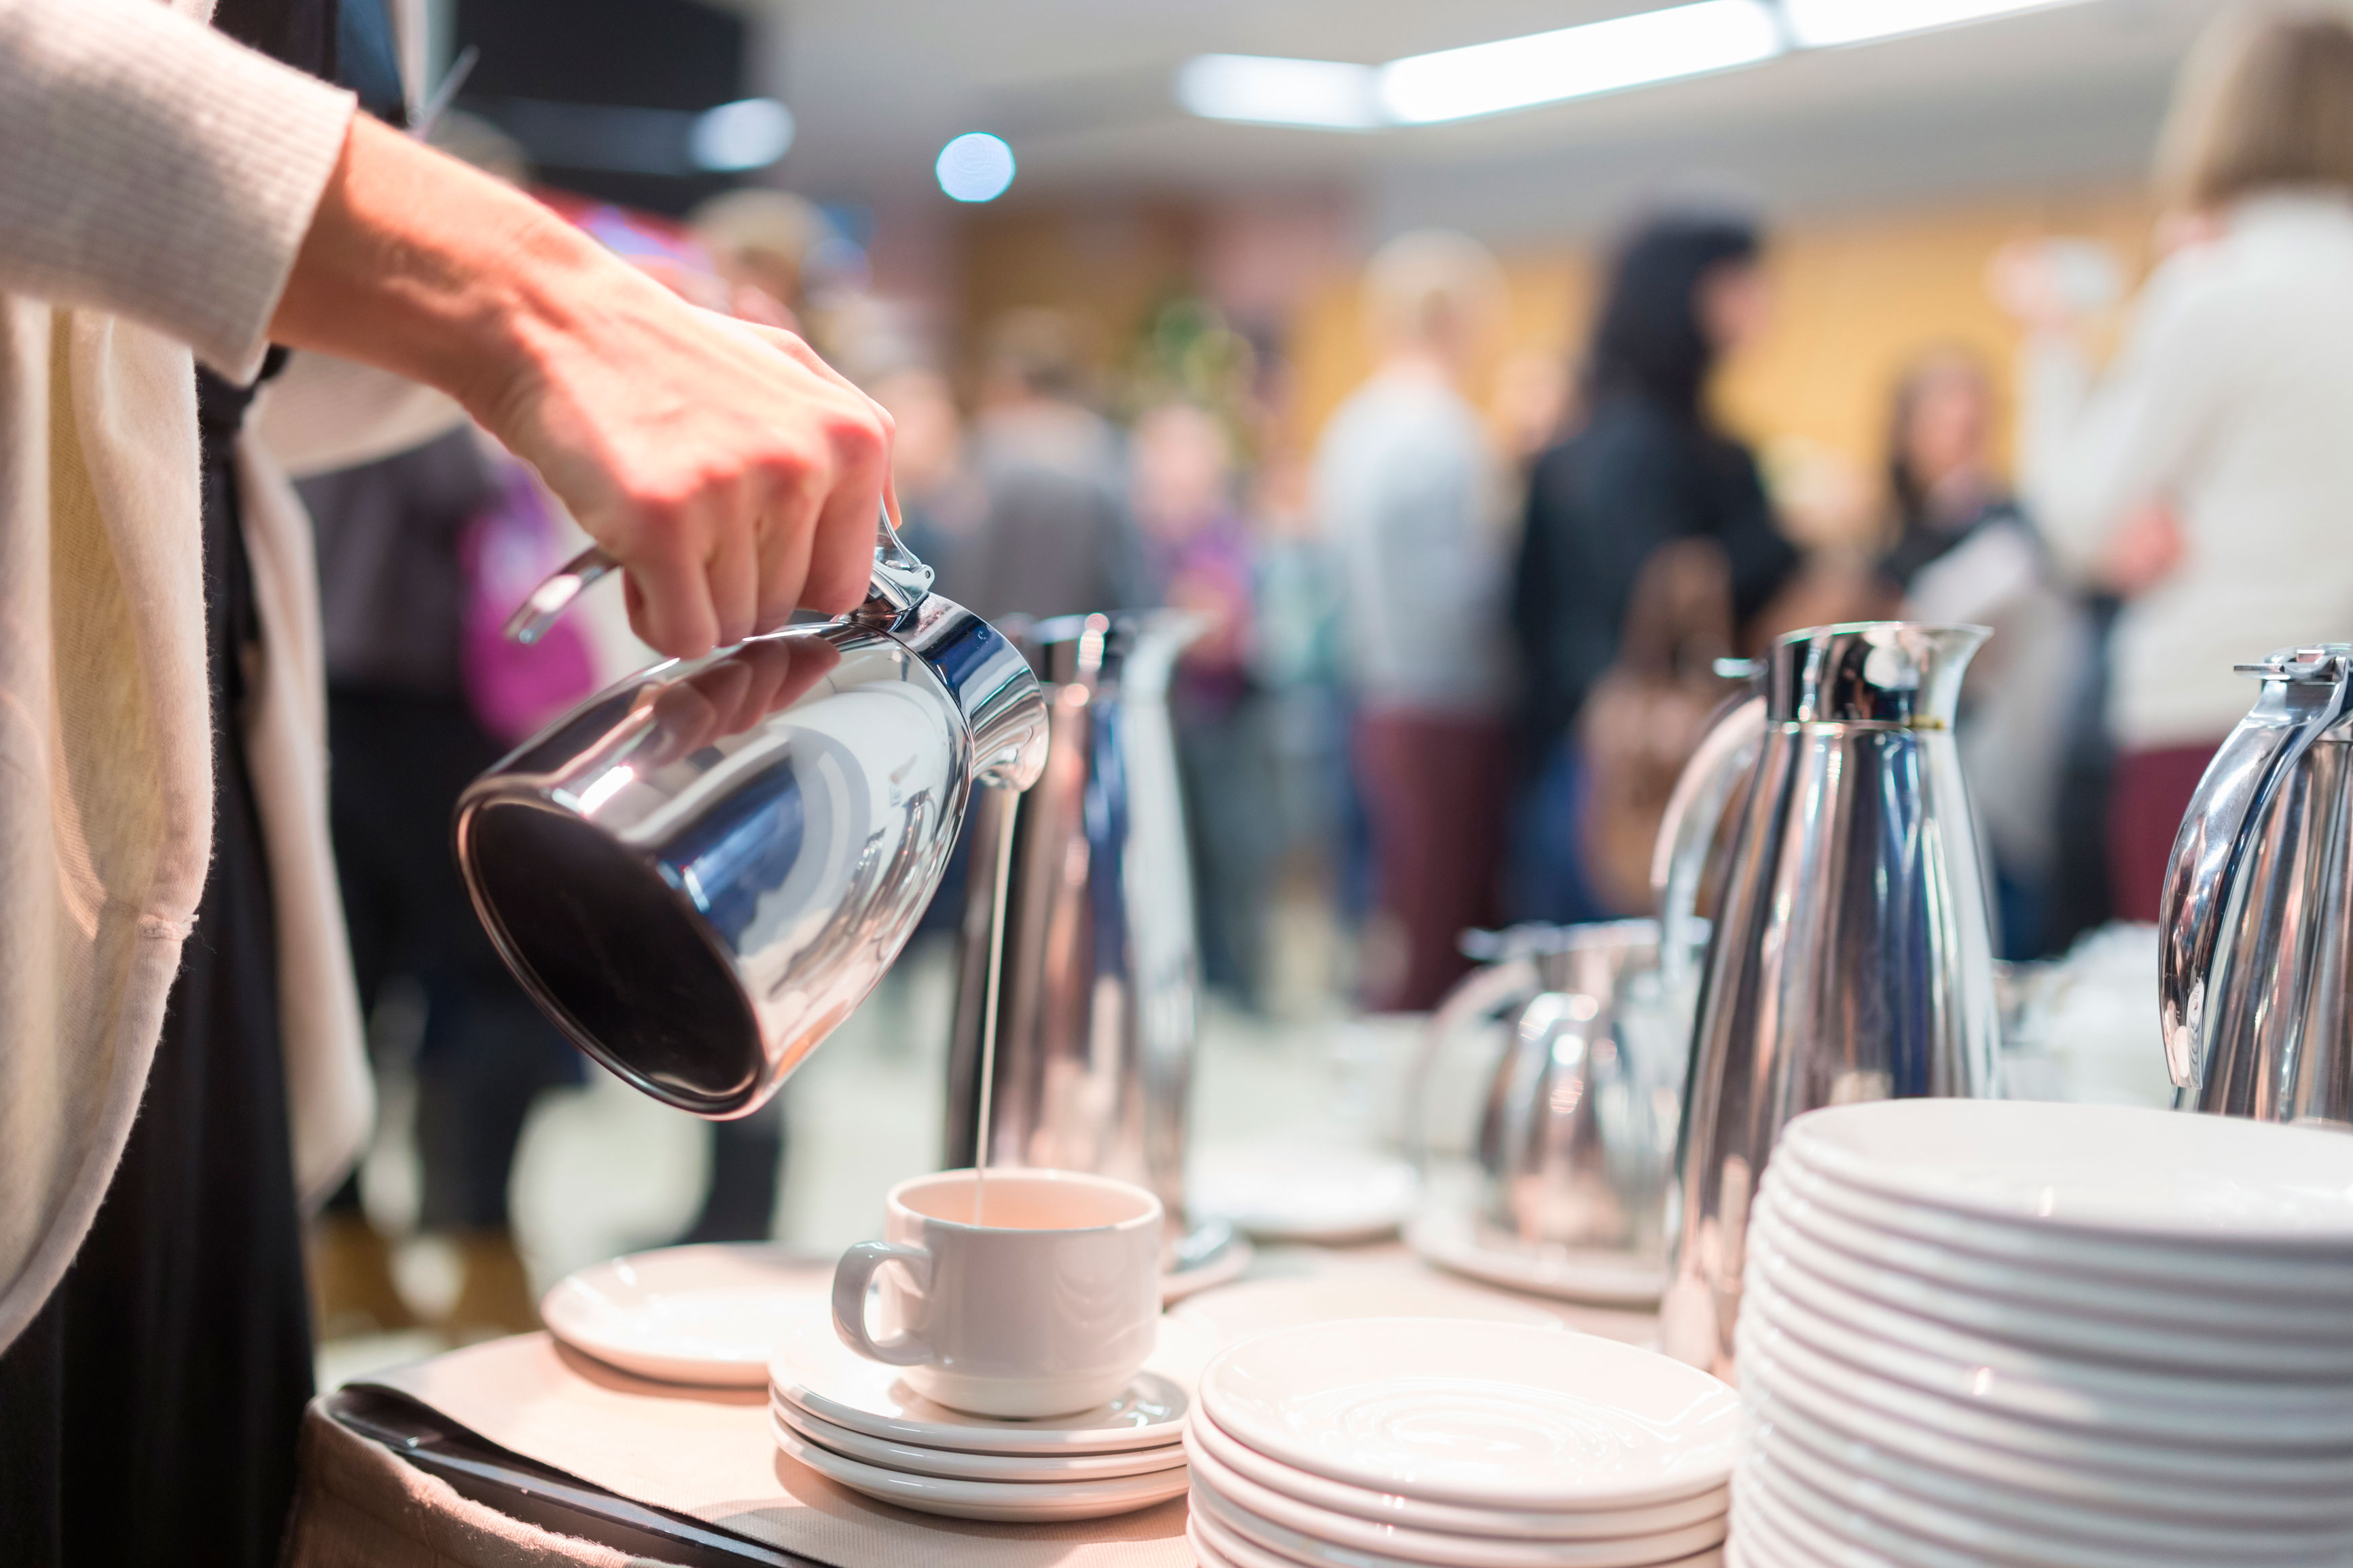 Hotel Korpilampi Espoo Helsinki Vantaa meetings conference incentive events MICE